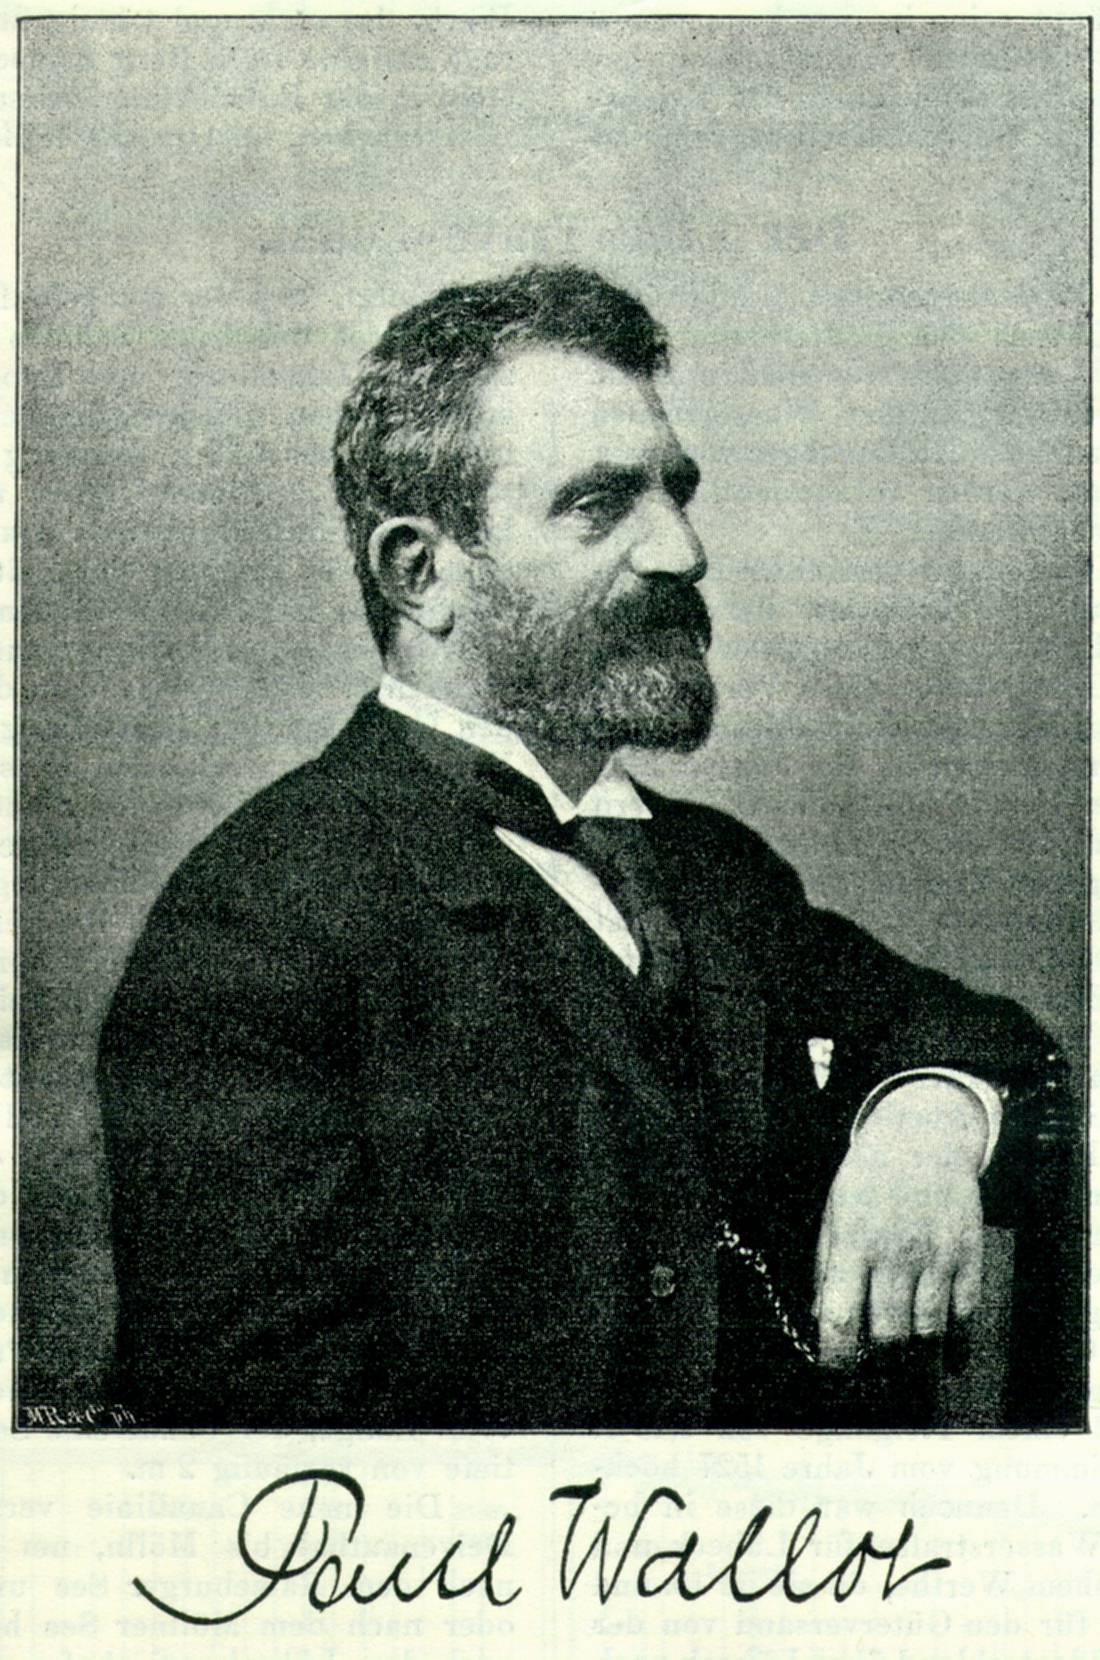 Paul Wallot, Alman mimar (ÖY-1912) tarihte bugün